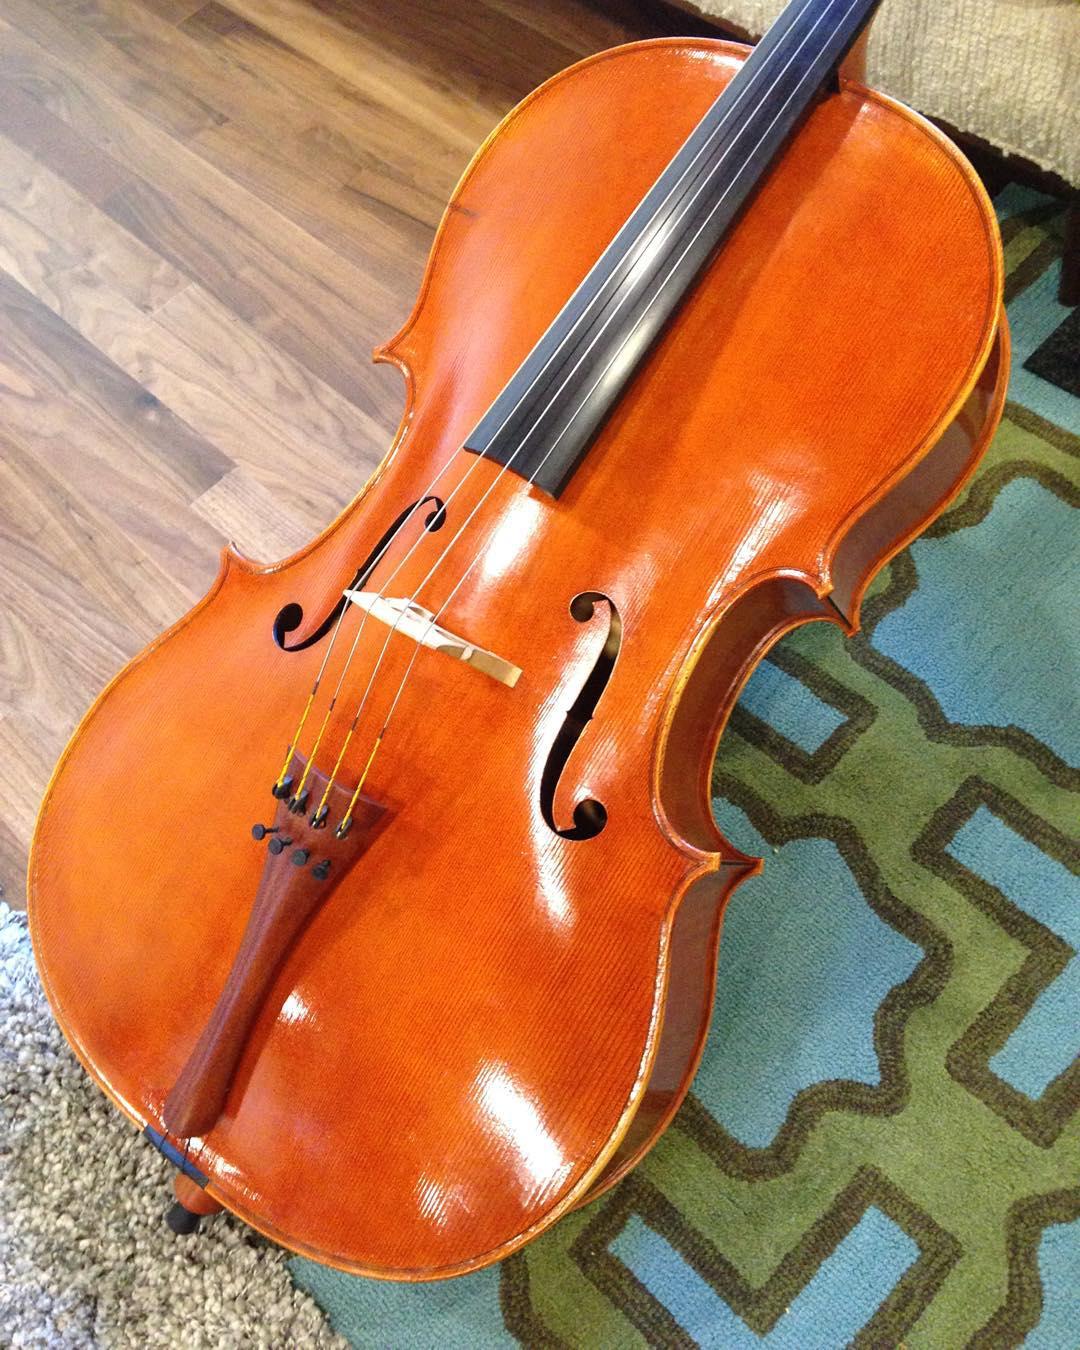 Kelvin Scott delivered my new cello today. It's beautiful!  #cello #luthier #music #instrument #kelvinscott  http://ift.tt/1jOHFUZ